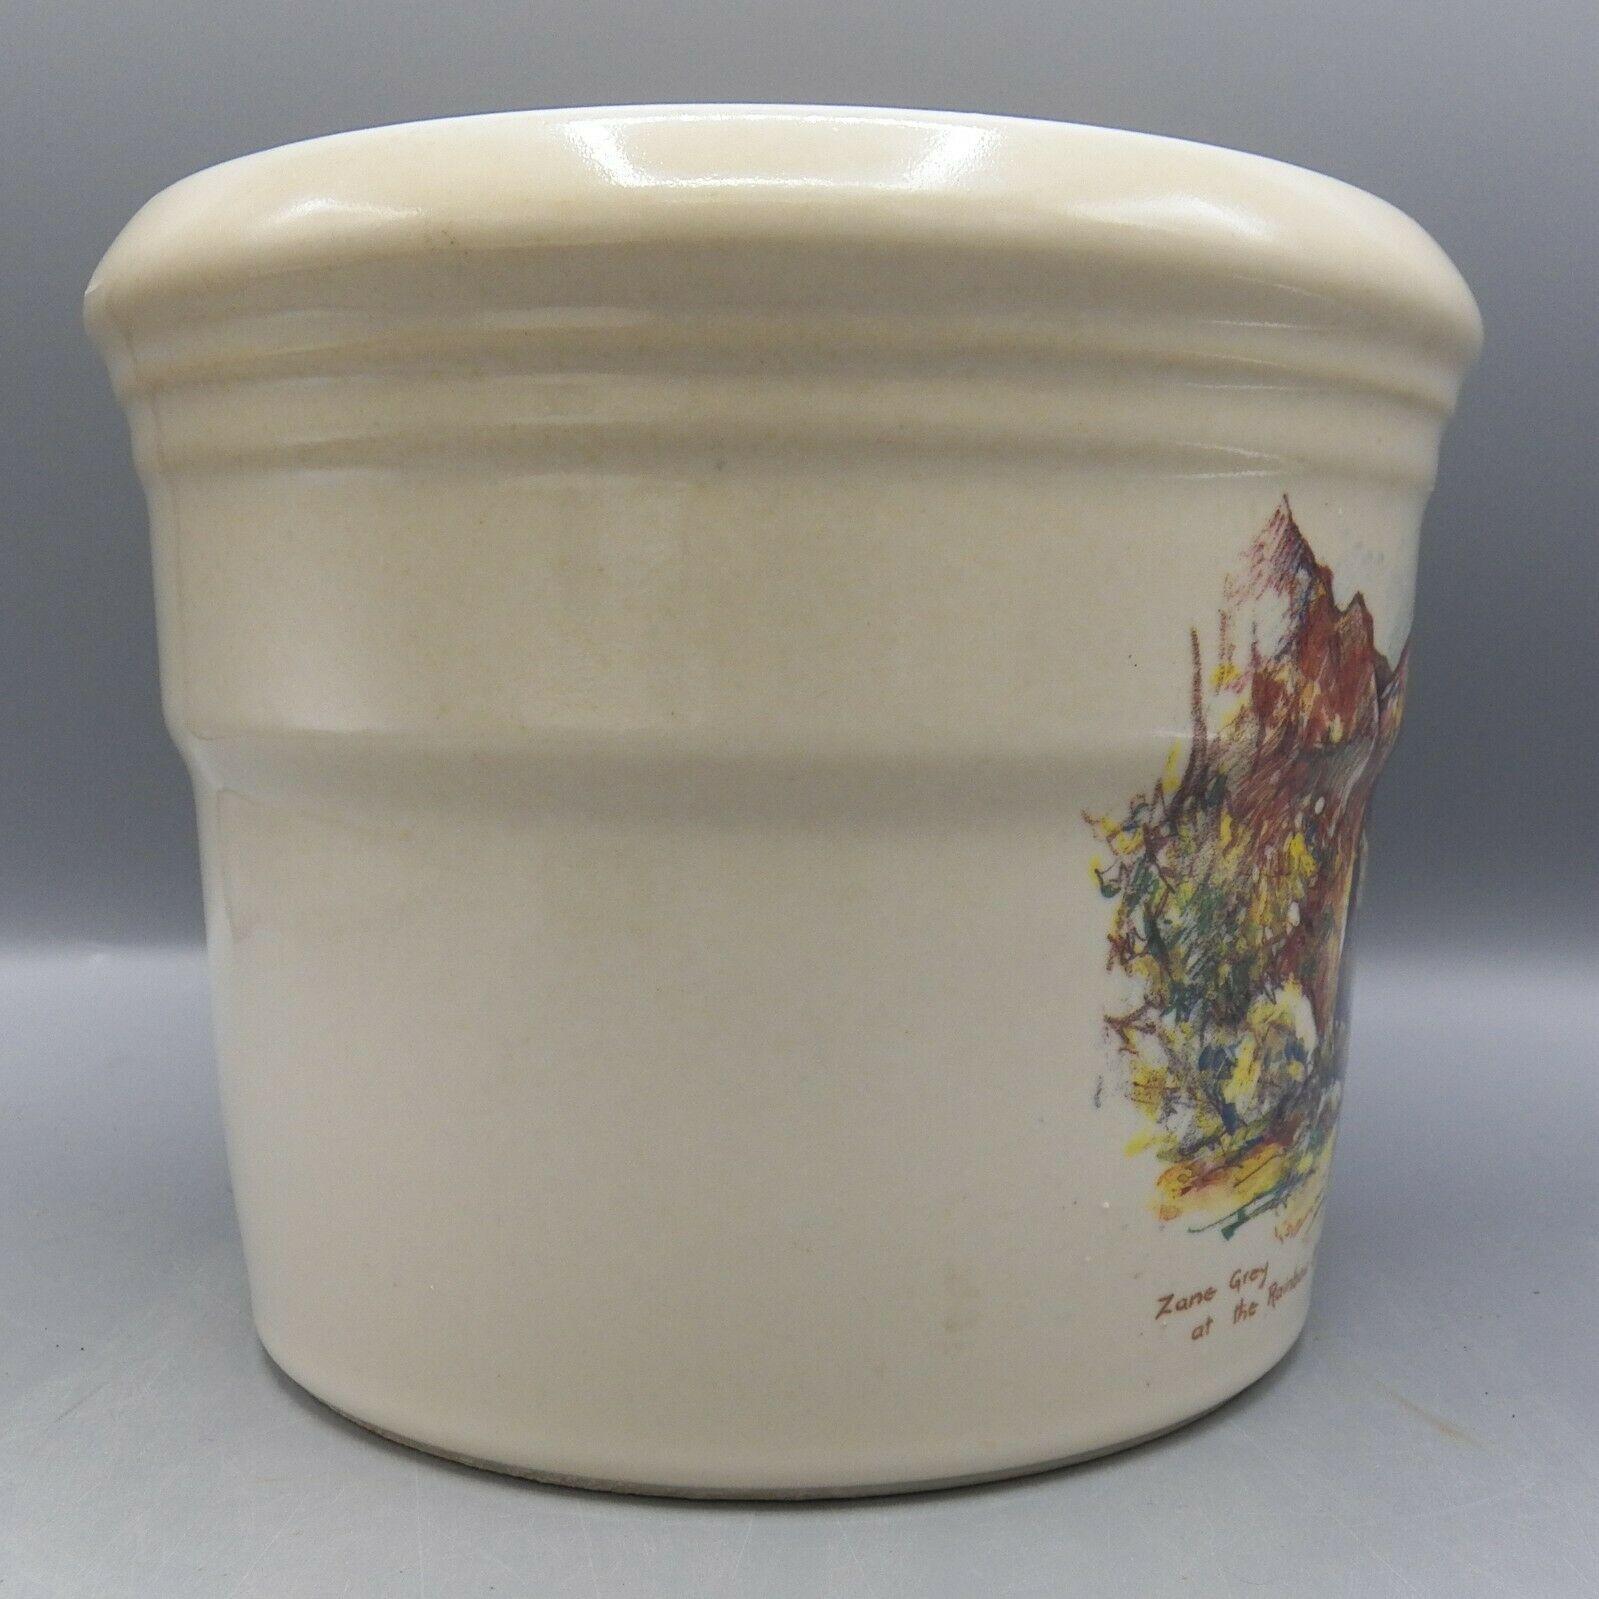 Zanesville Stoneware Zane Grey At Rainbow Bridge Leslie Cope Vase Pot Pottery image 9